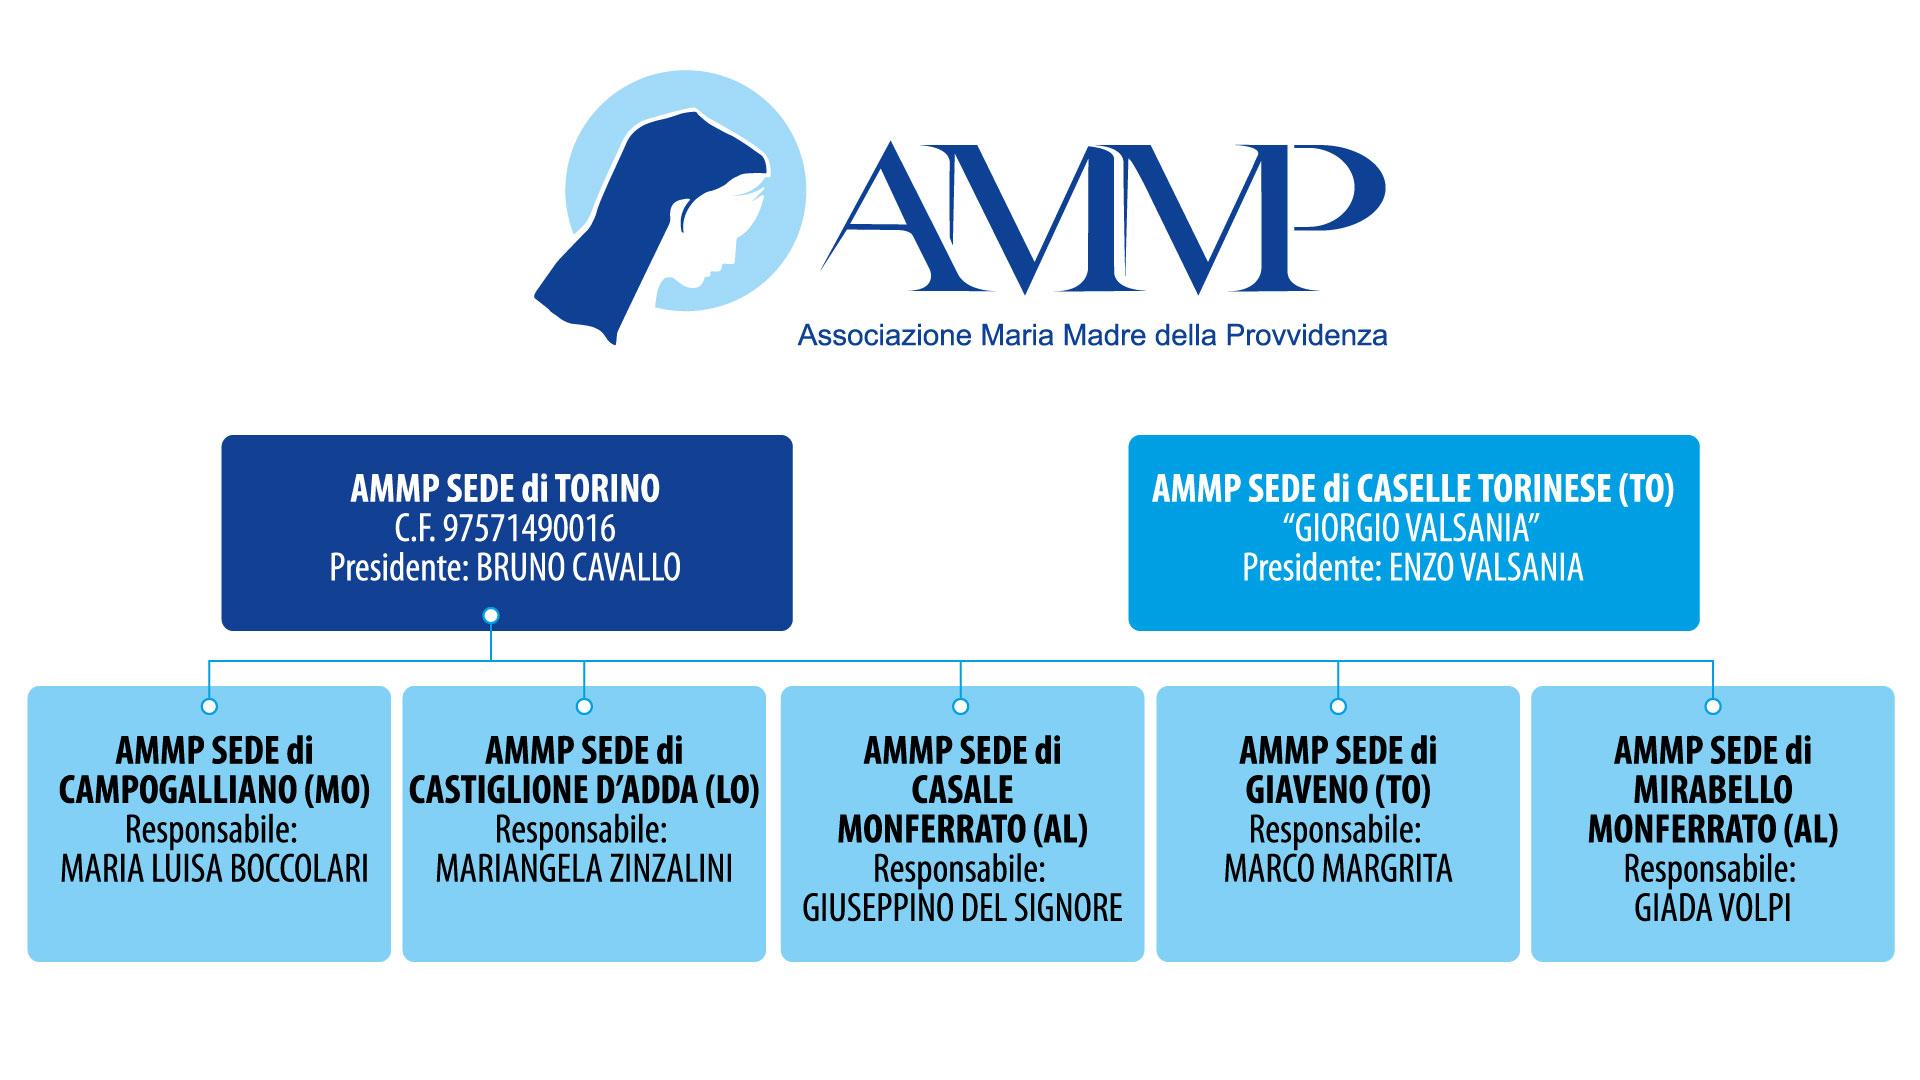 organigramma AMMP